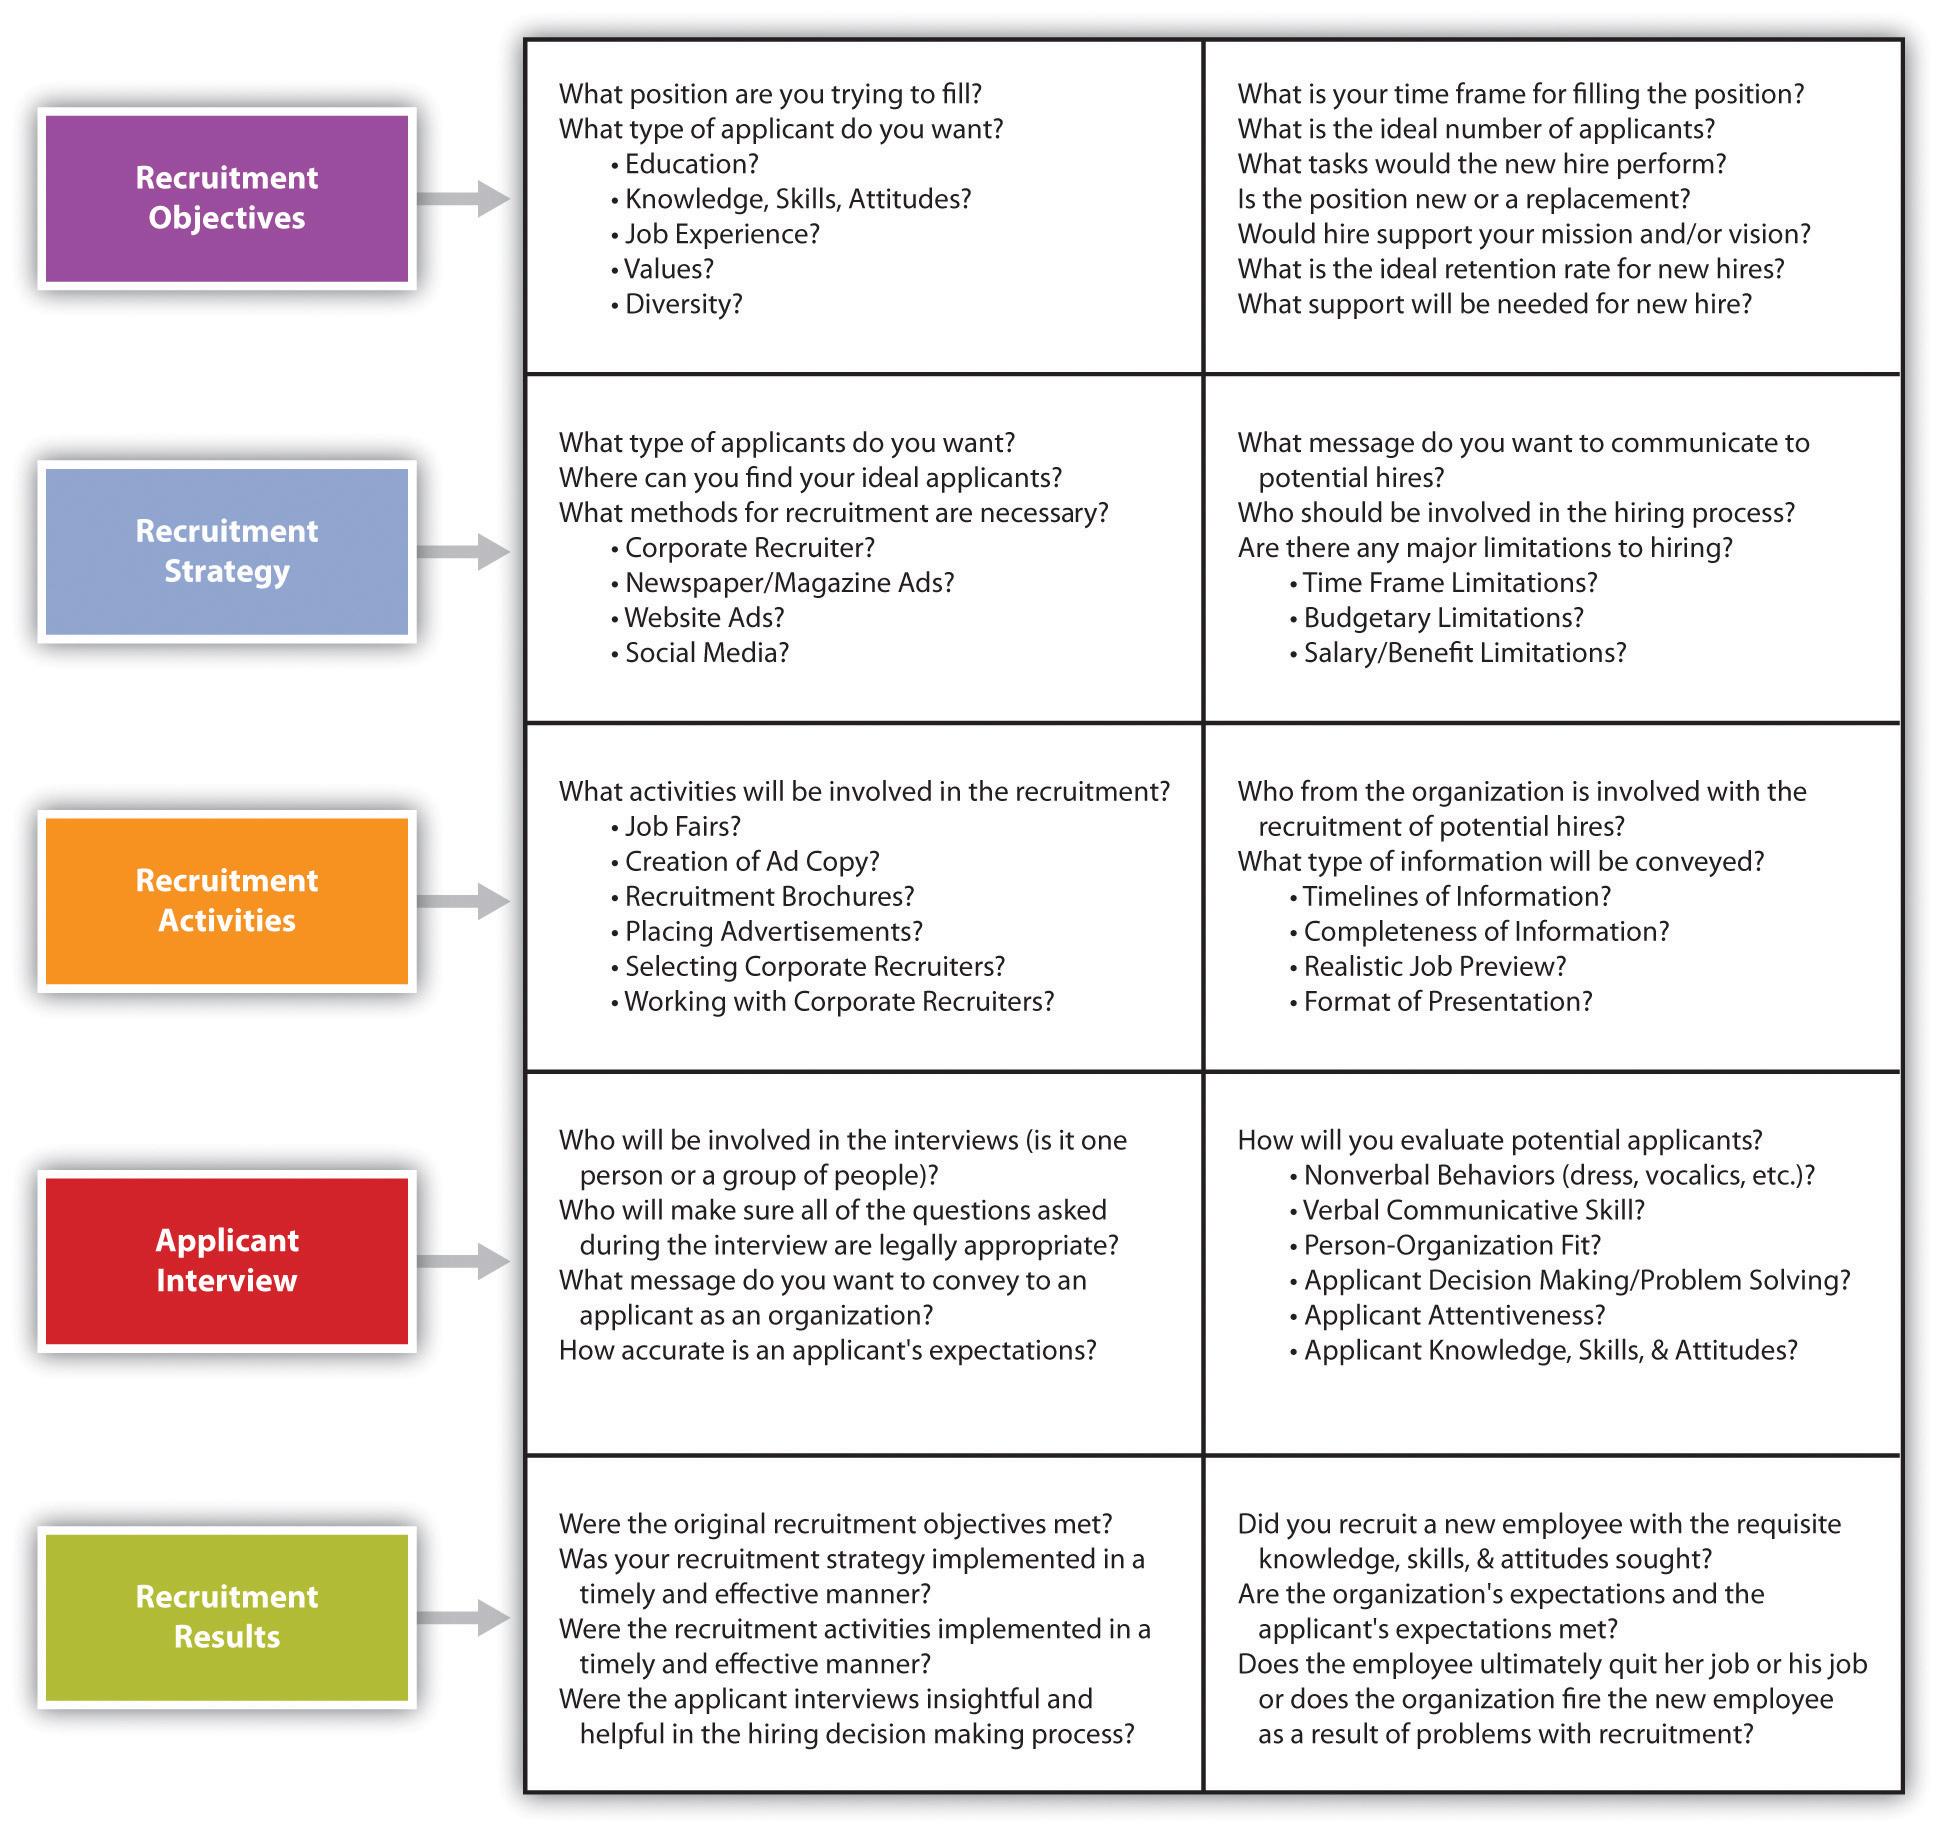 pdf Gastrointestinal Endoscopy in Practice: Expert